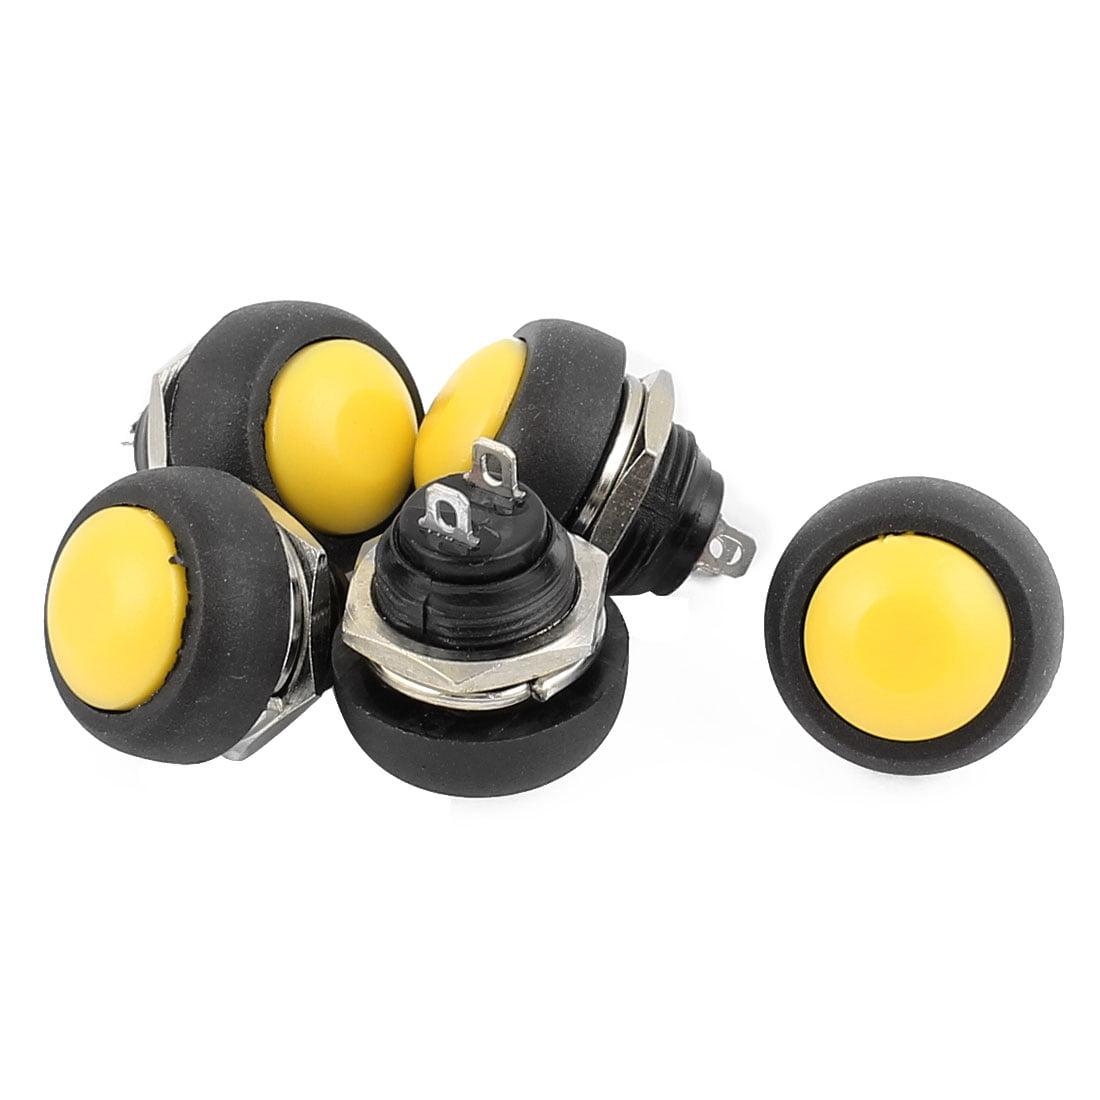 5Pcs 12mm Thread SPST Push Button Switch Momentary Type Plastic Head